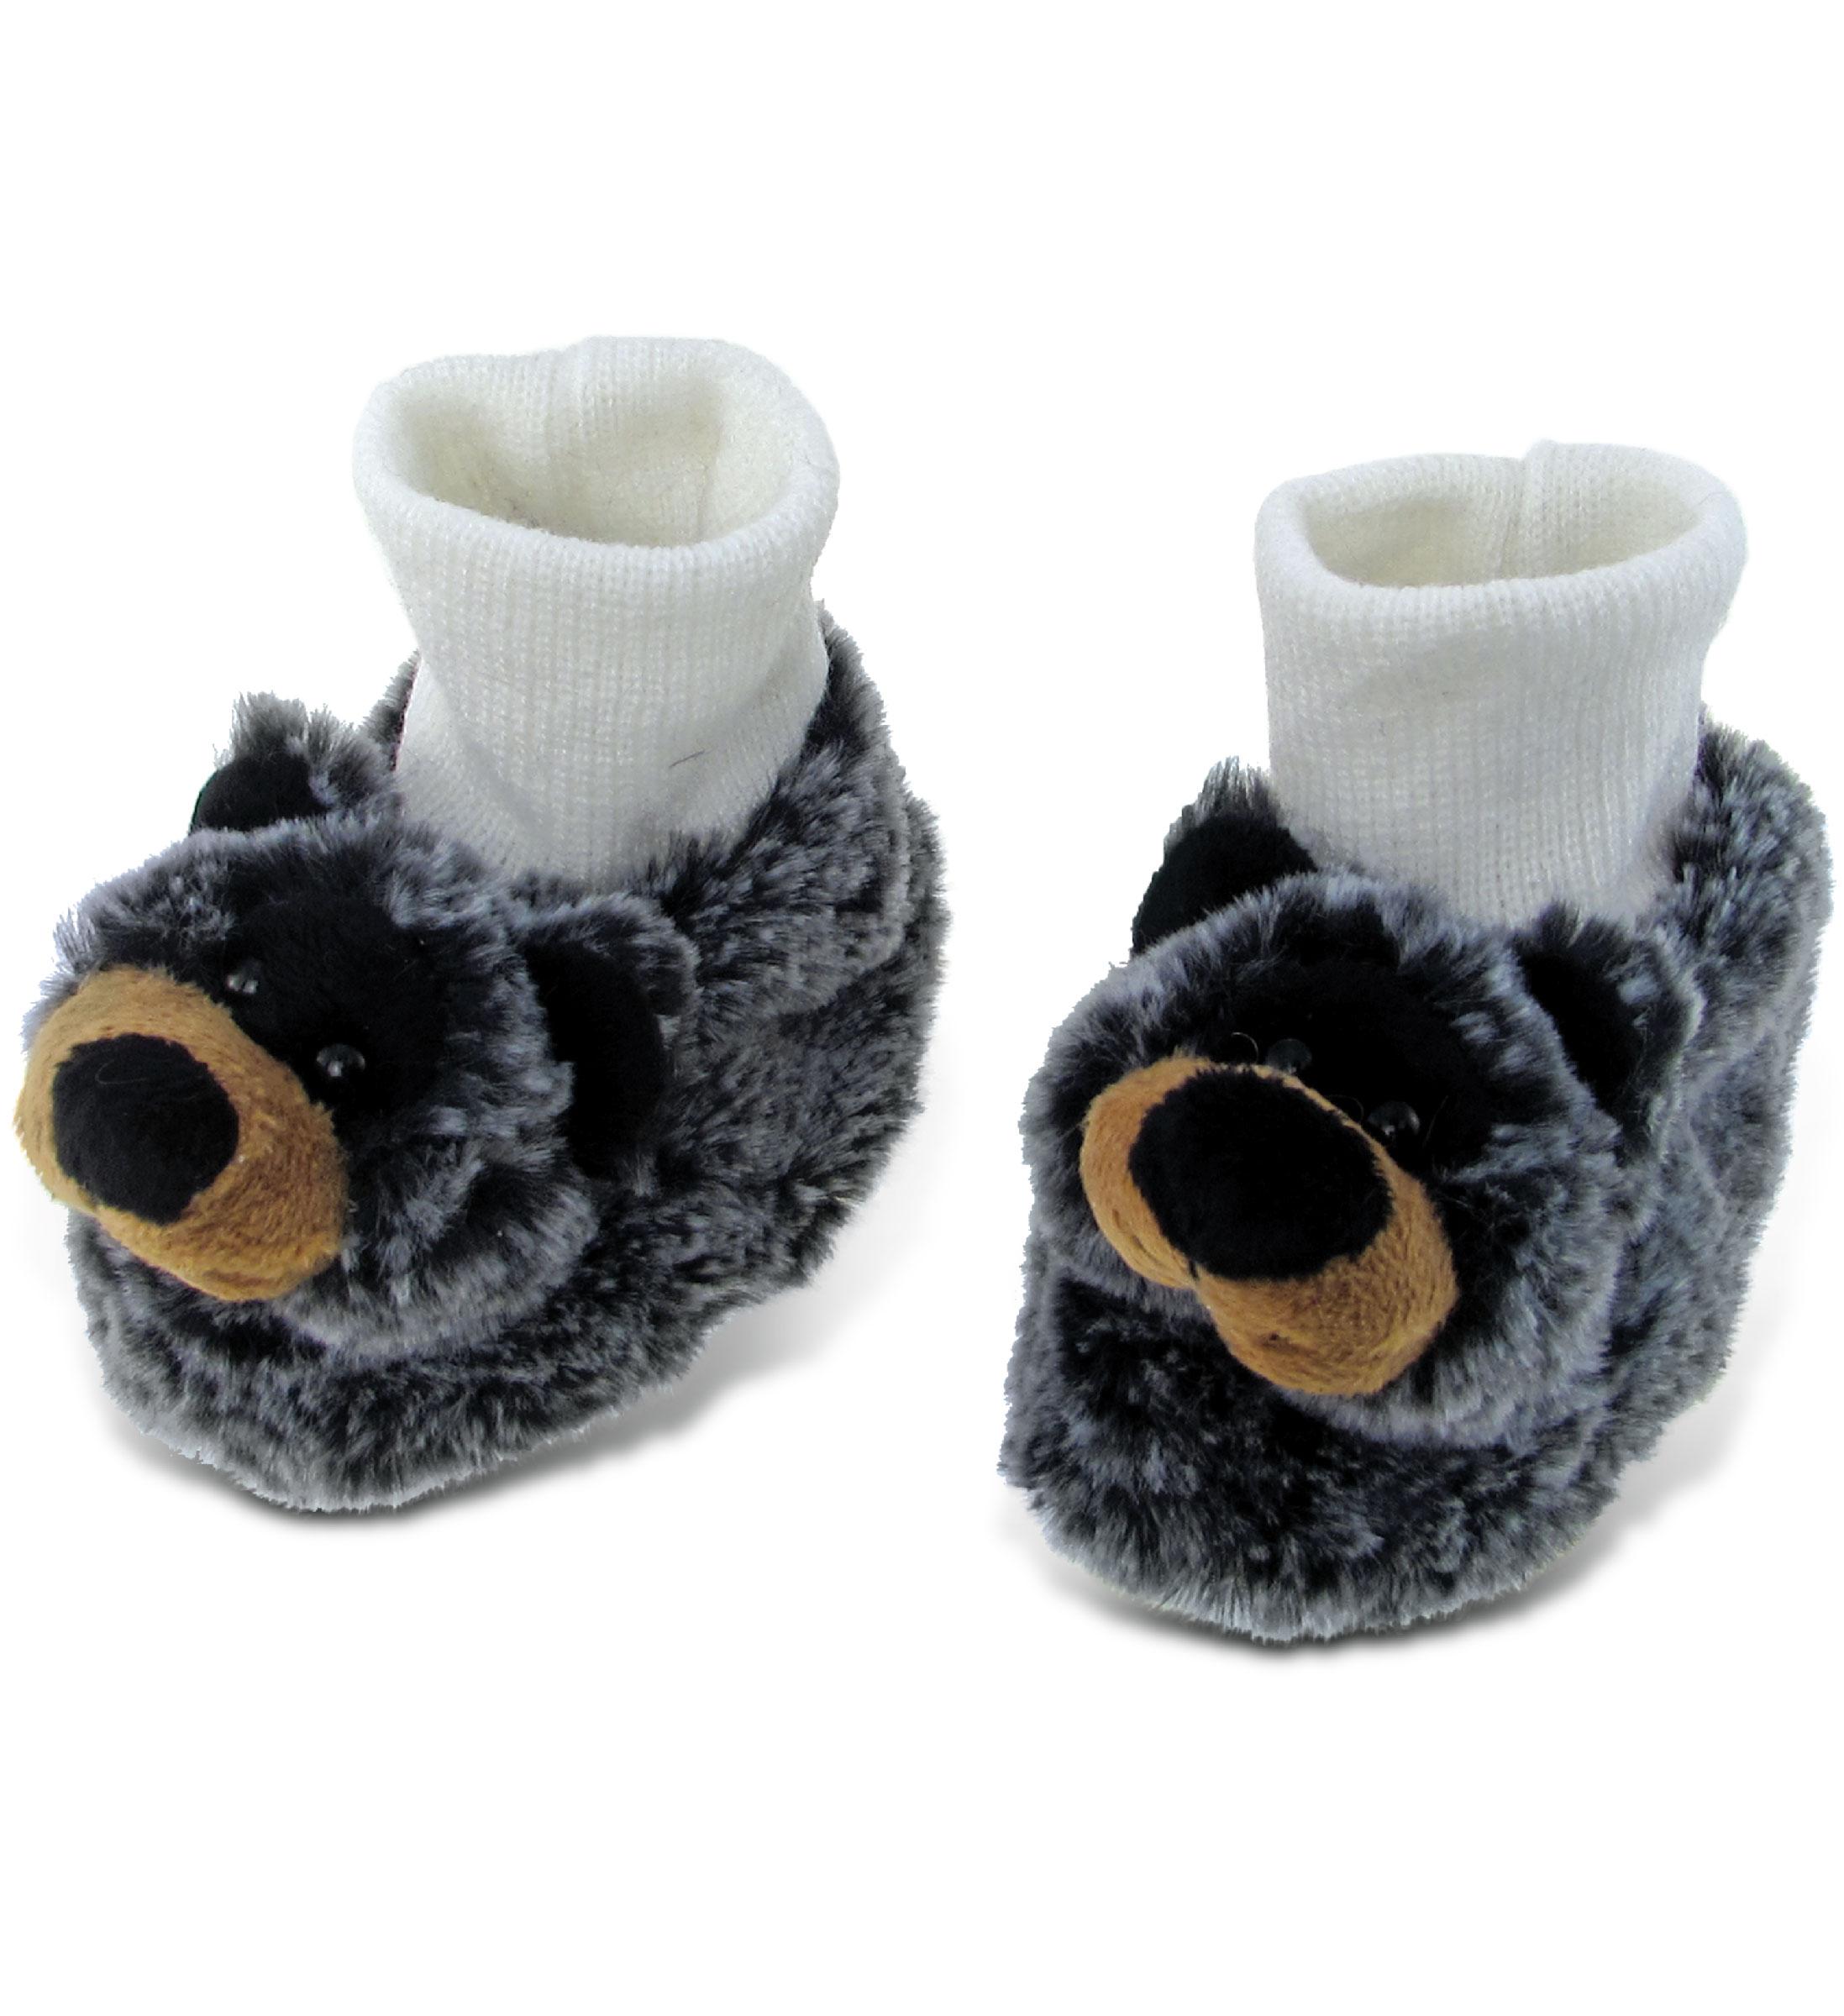 Black Bear - Super Soft Plush Baby SHOES